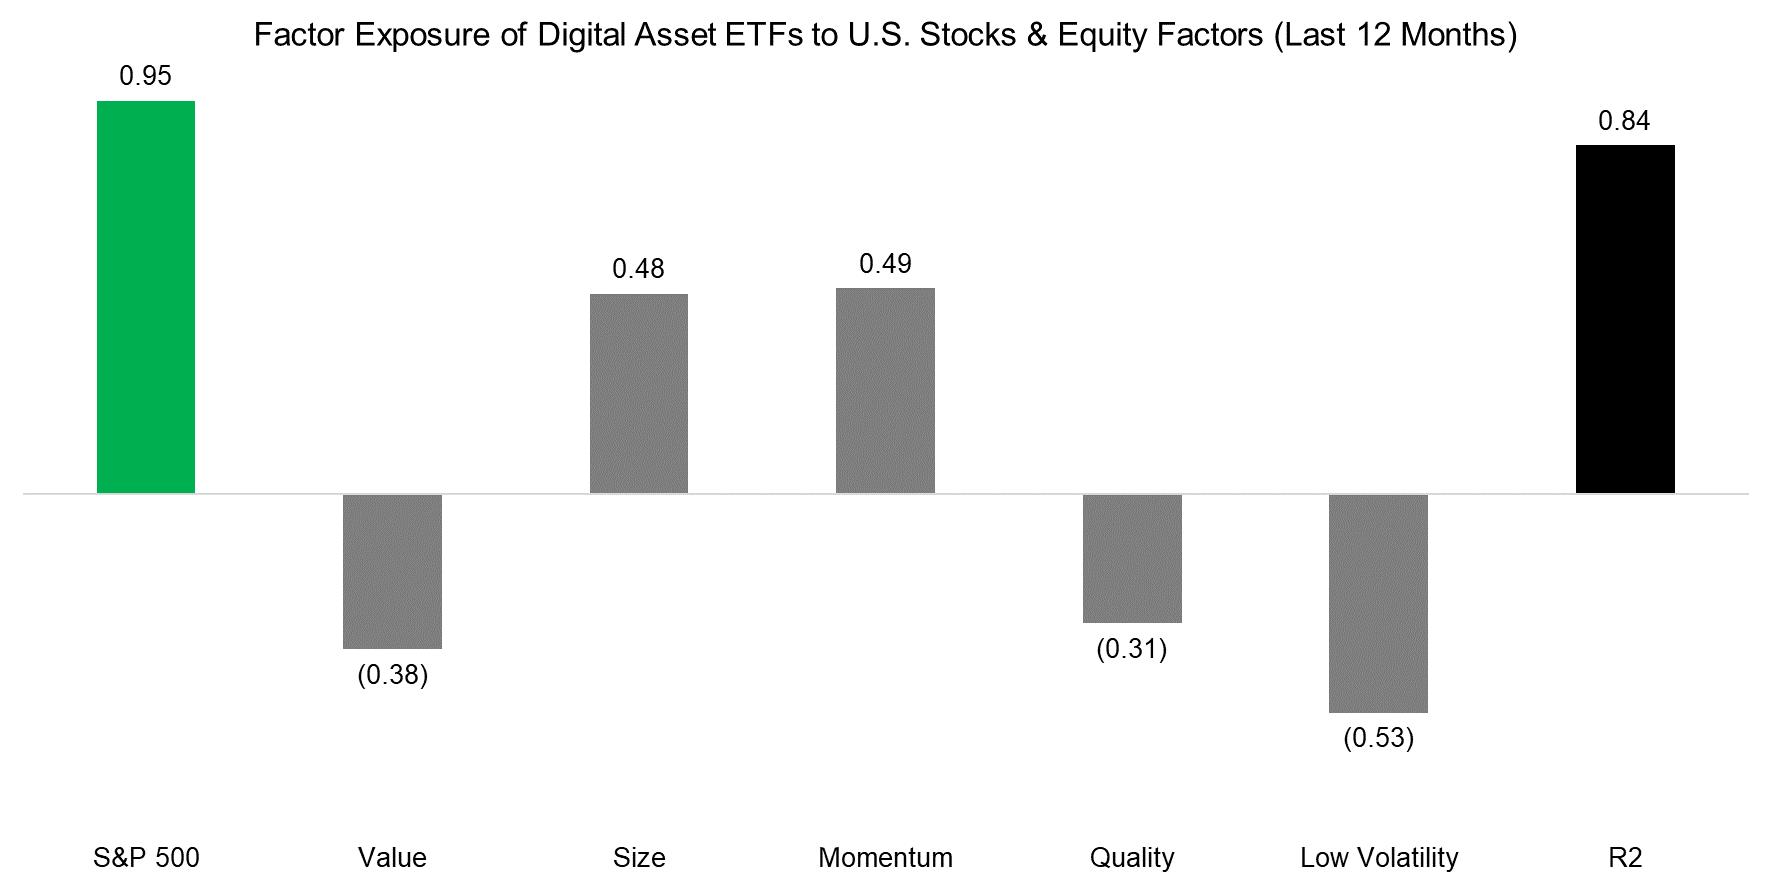 Factor Exposure of Digital Asset ETFs to U.S. Stocks & Equity Factors (Last 12 Months)